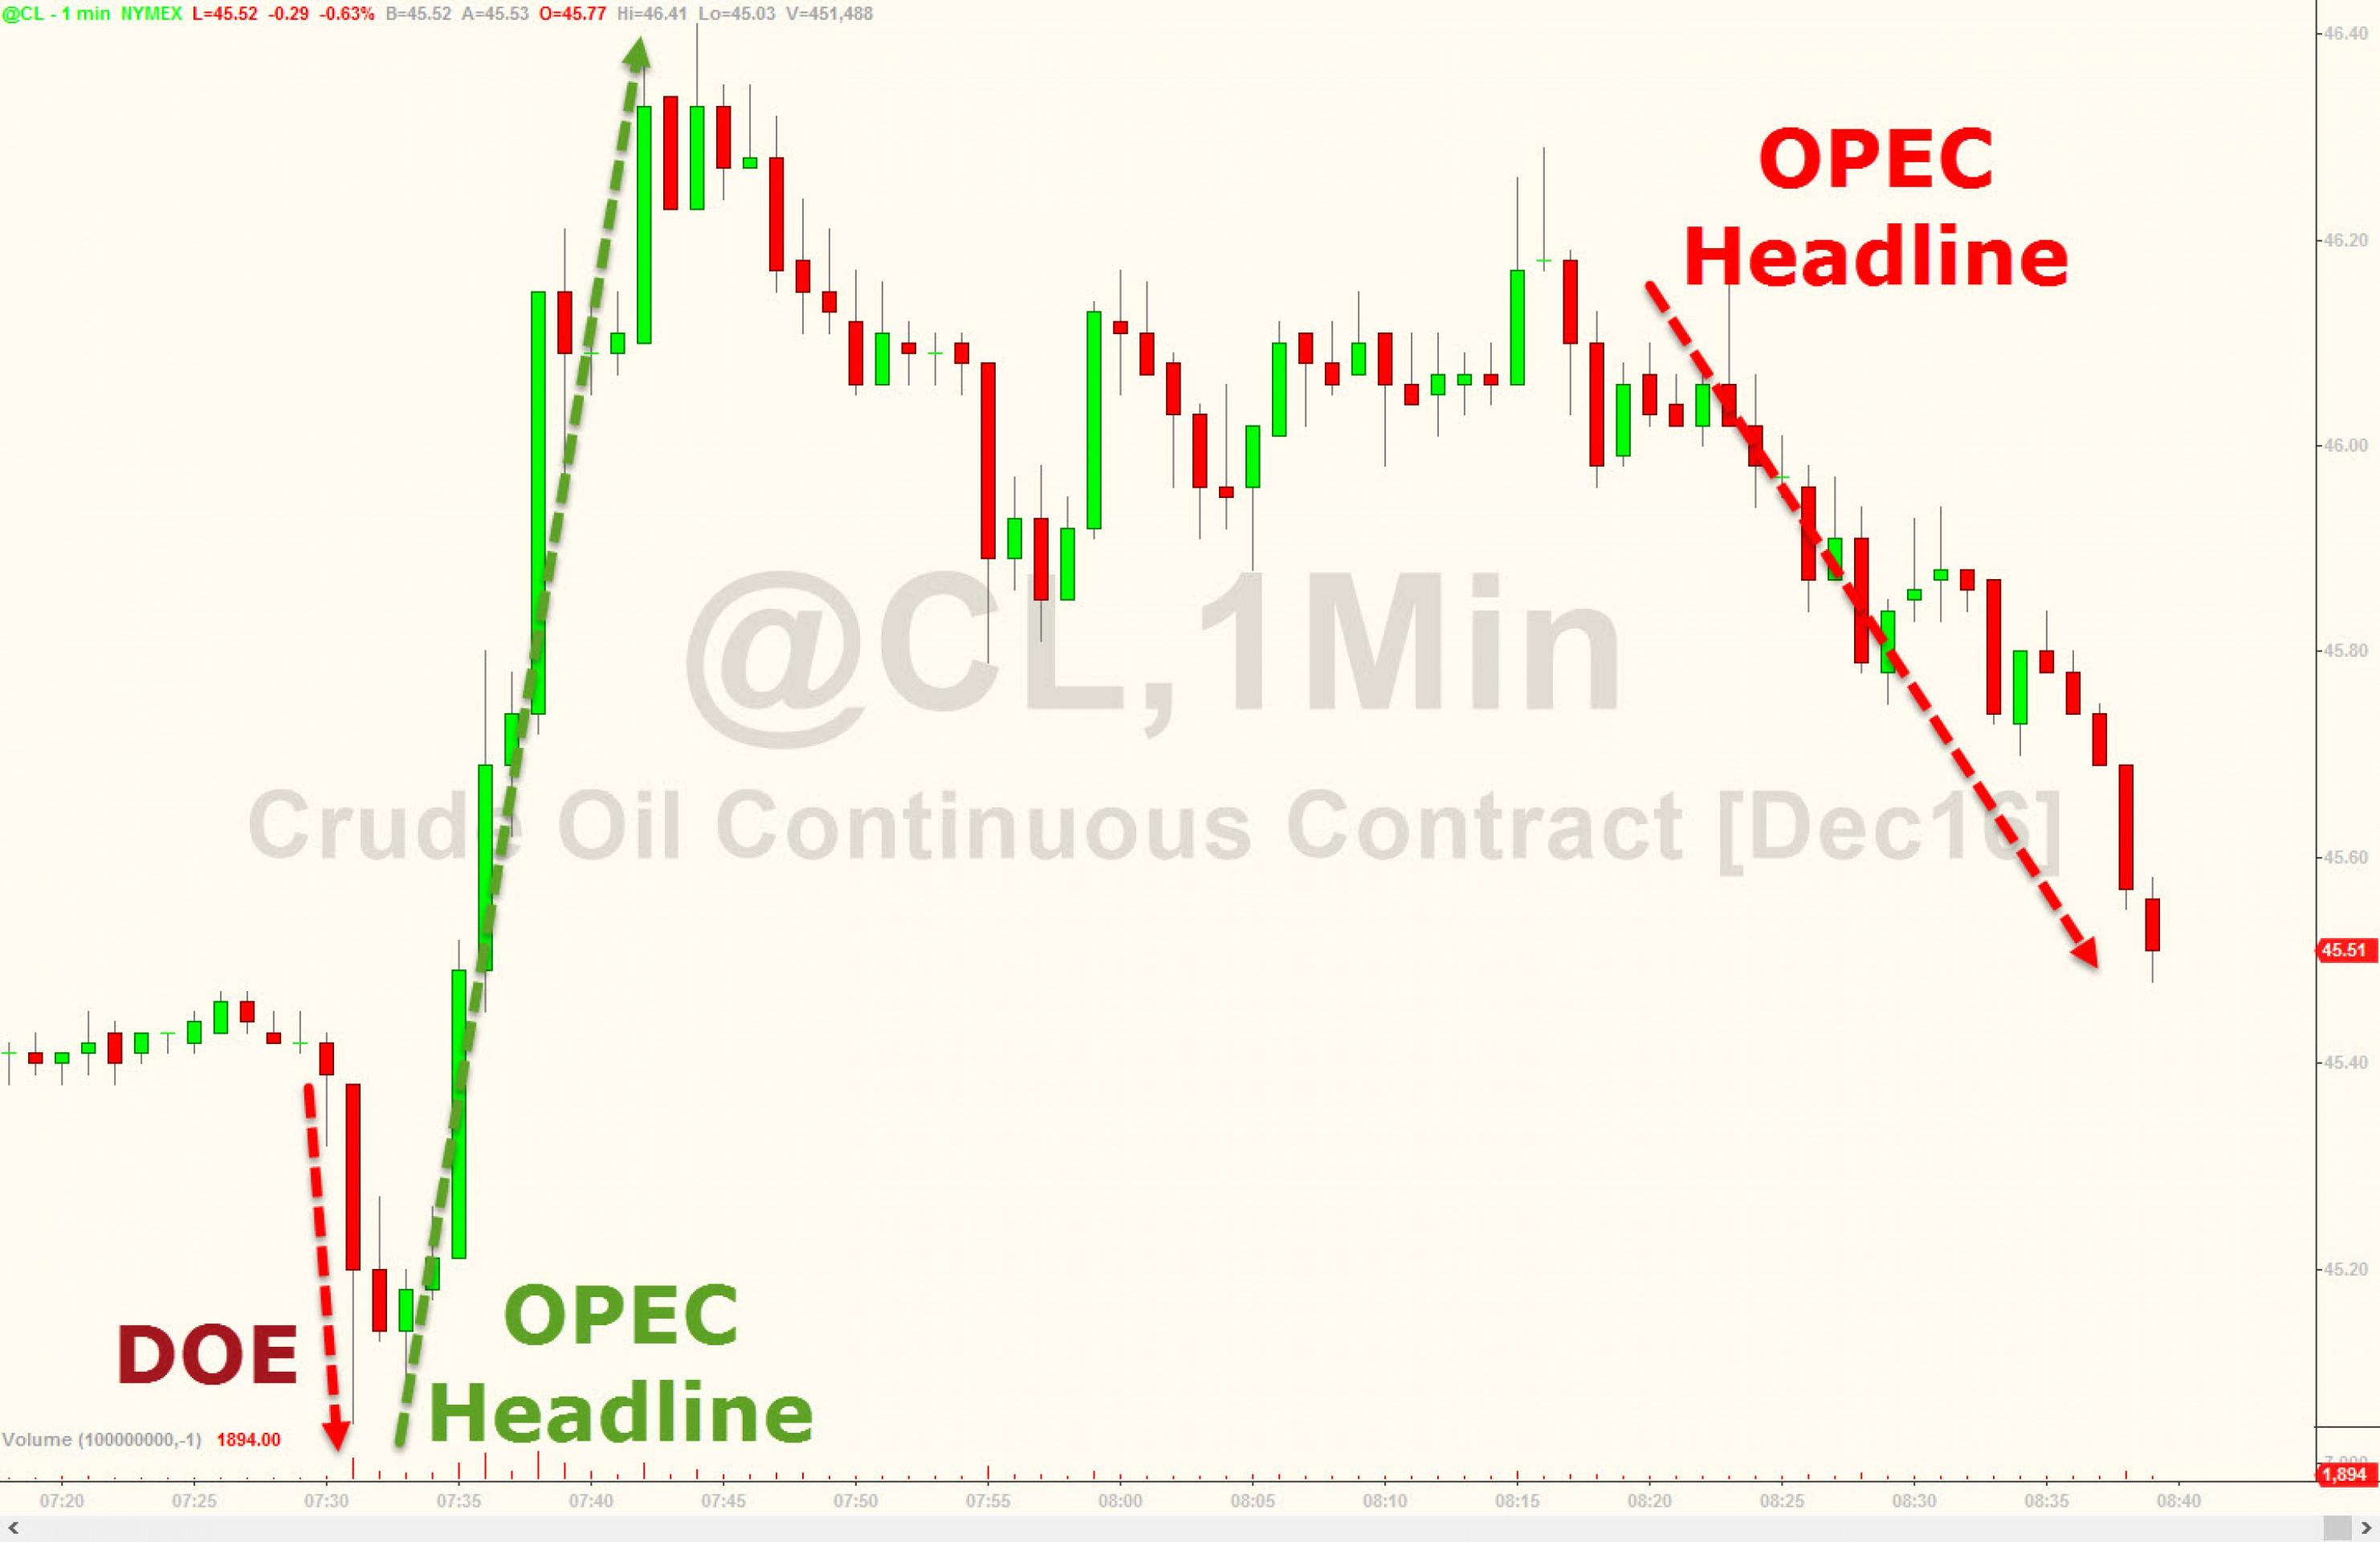 Нигерия, Ирак и Иран пропустят встречу ОПЕК